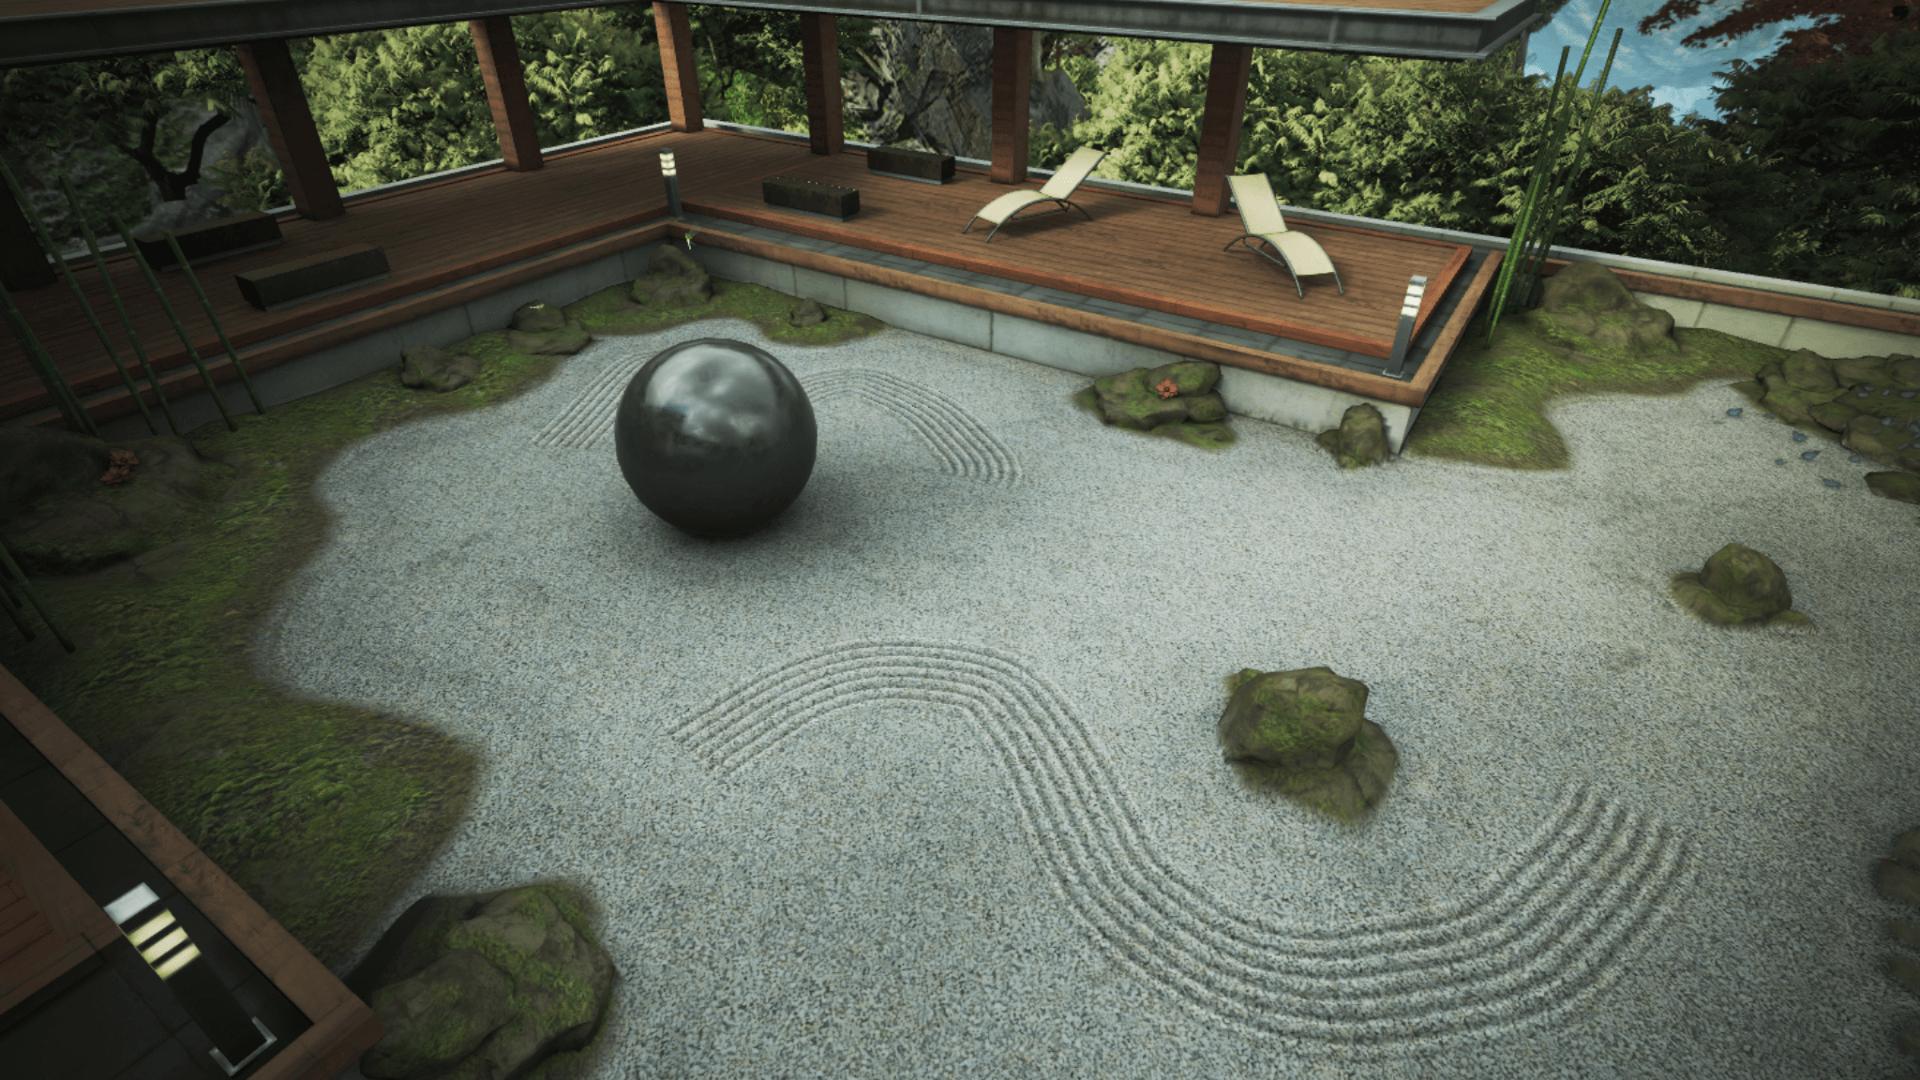 zen sand garden zen grten garten europa so knnen sie einen mini zen garten kreieren zen sand. Black Bedroom Furniture Sets. Home Design Ideas